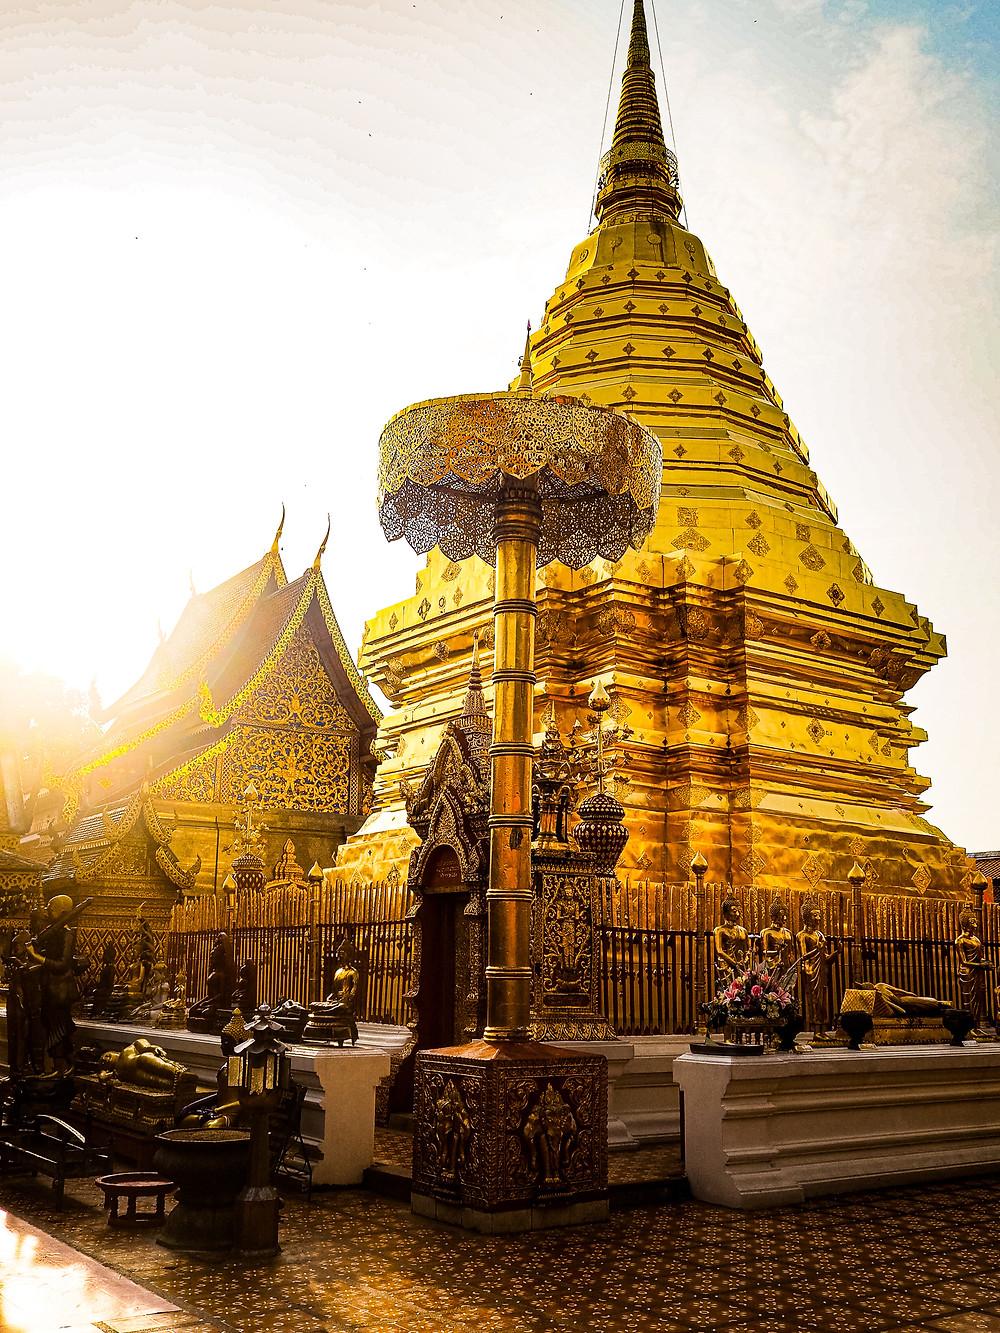 Wat Phrathat Doi Suthep, a Buddhist Temple in Chiang Mai, Thailand